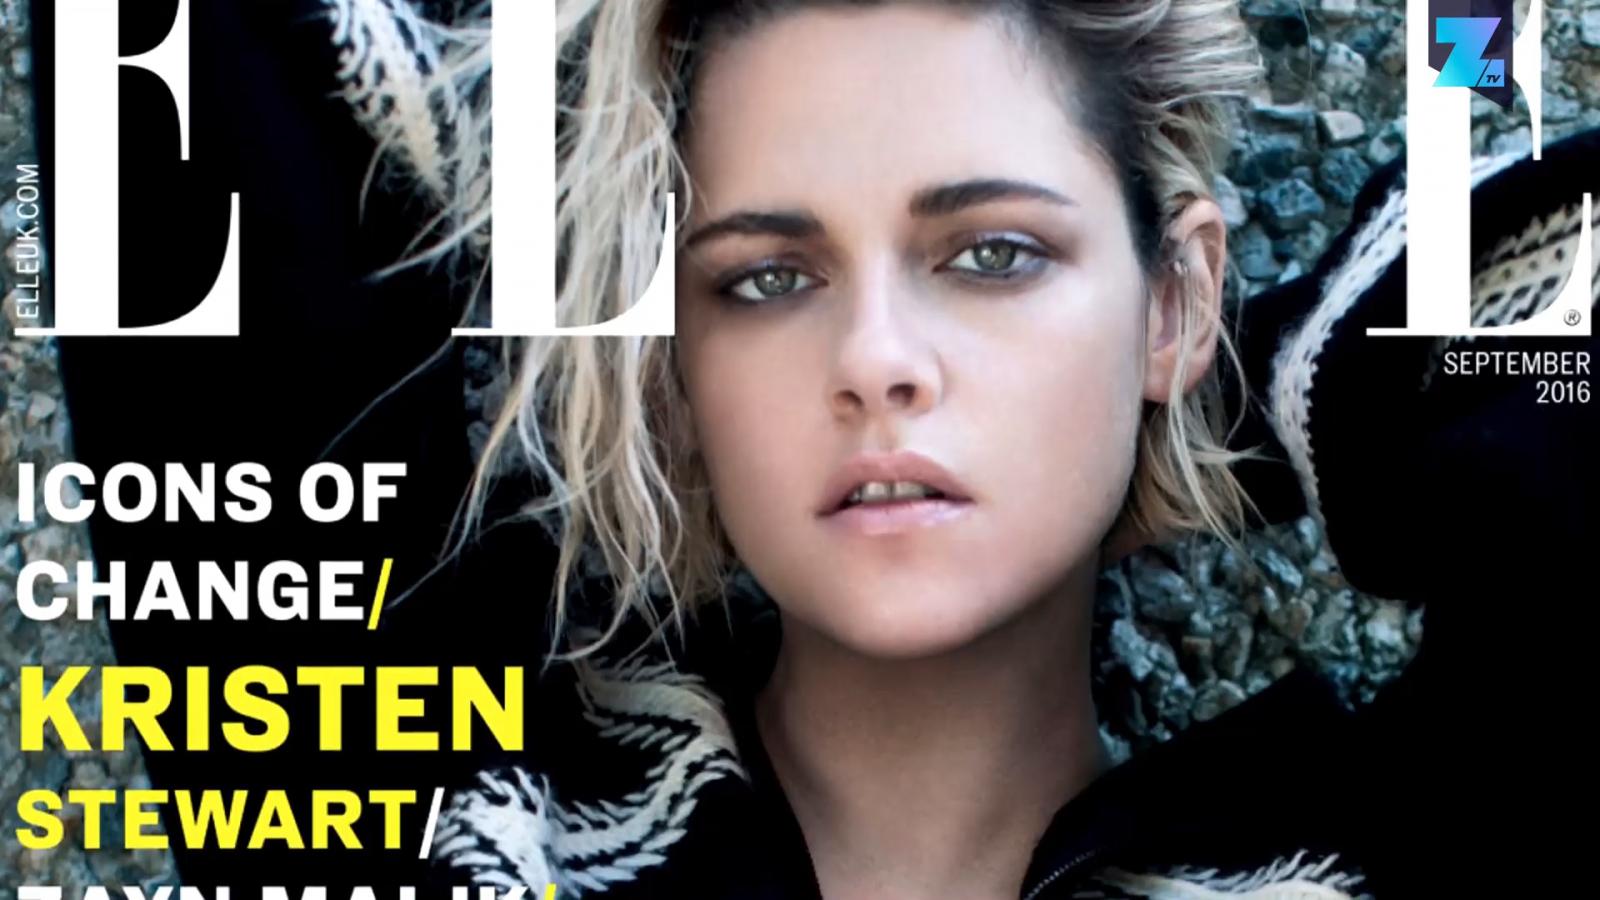 Kristen Stewart Slammed For Being 'Ungrateful' After Not